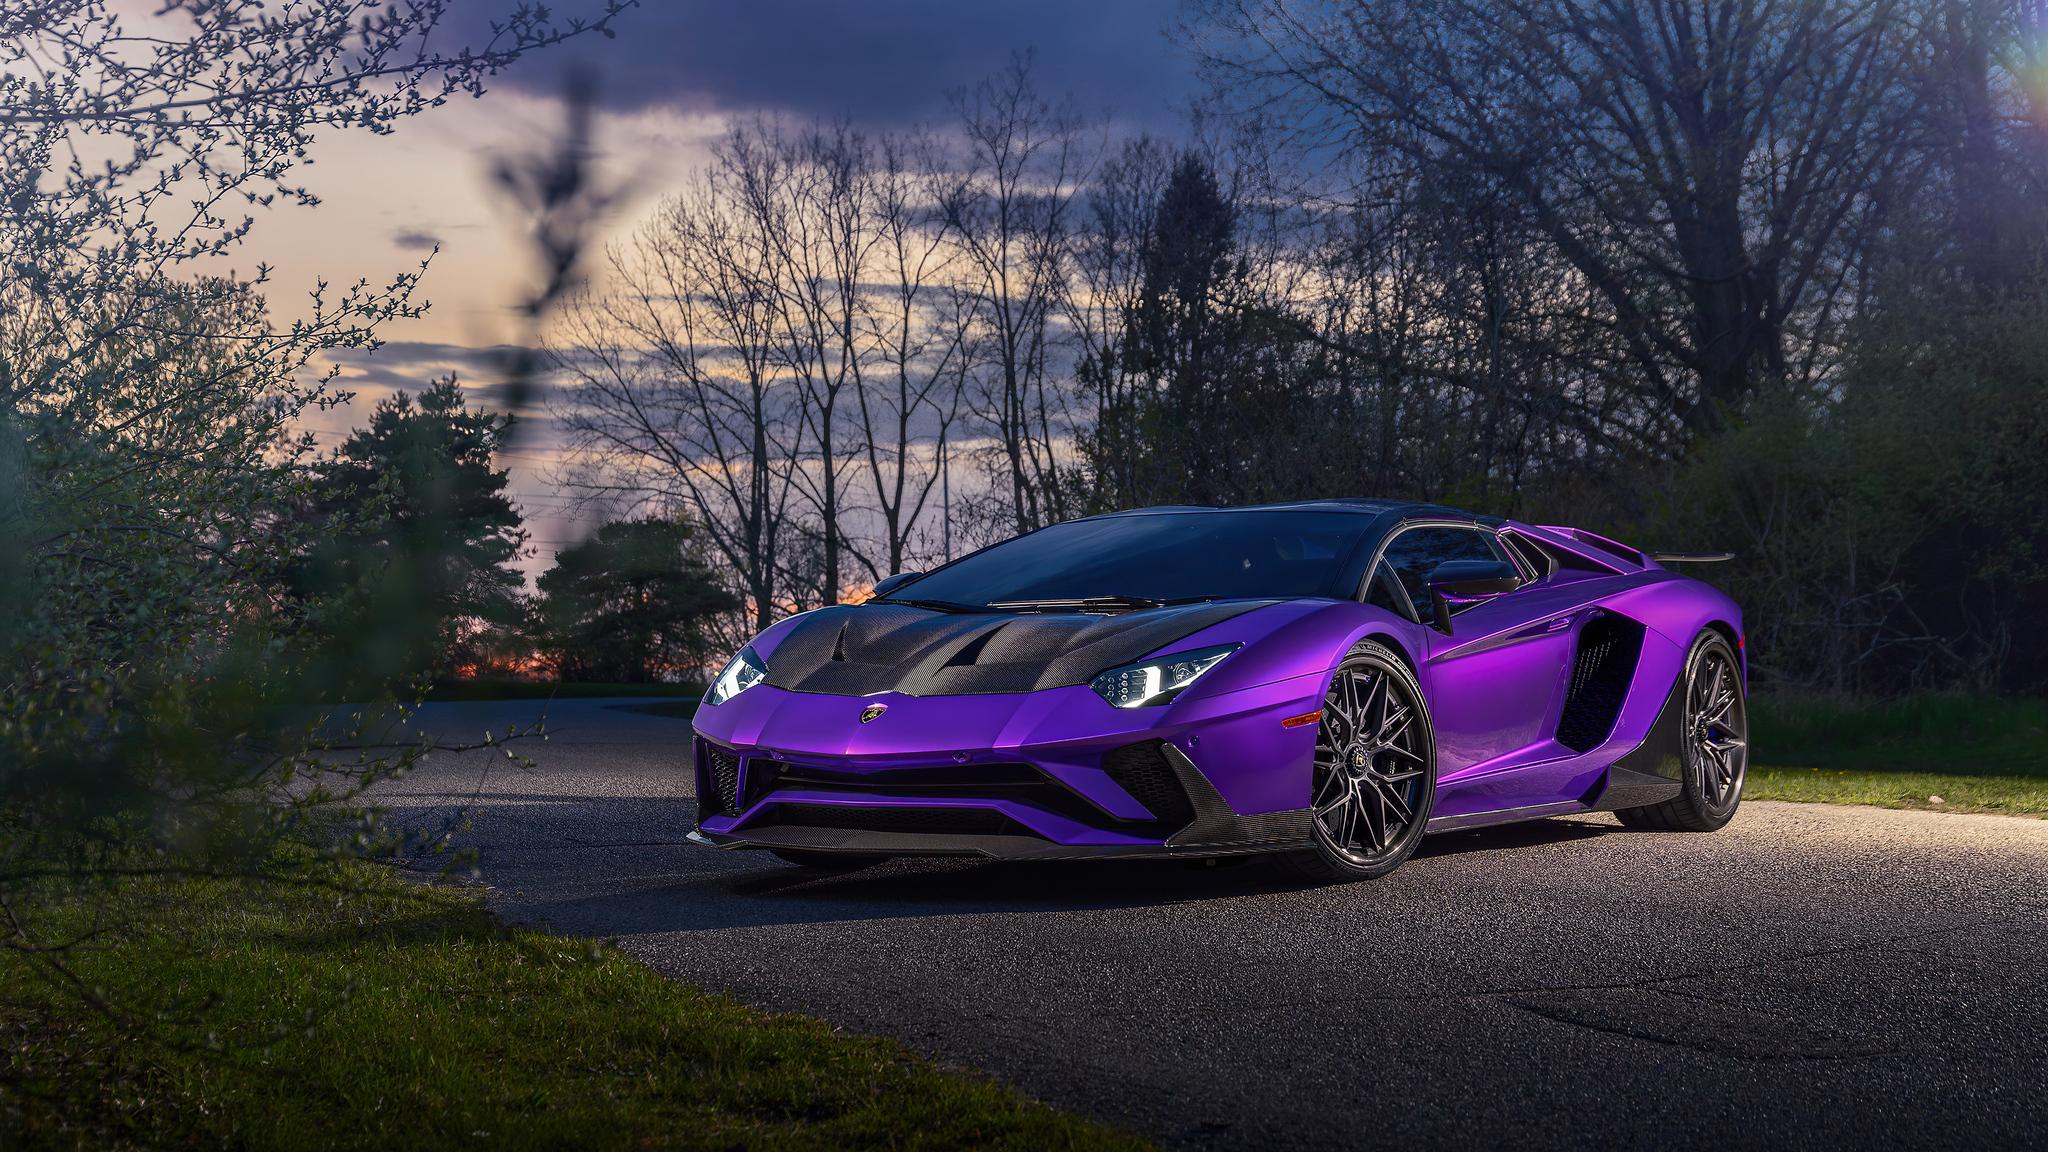 purple-lamborghini-aventador-5k-jw.jpg